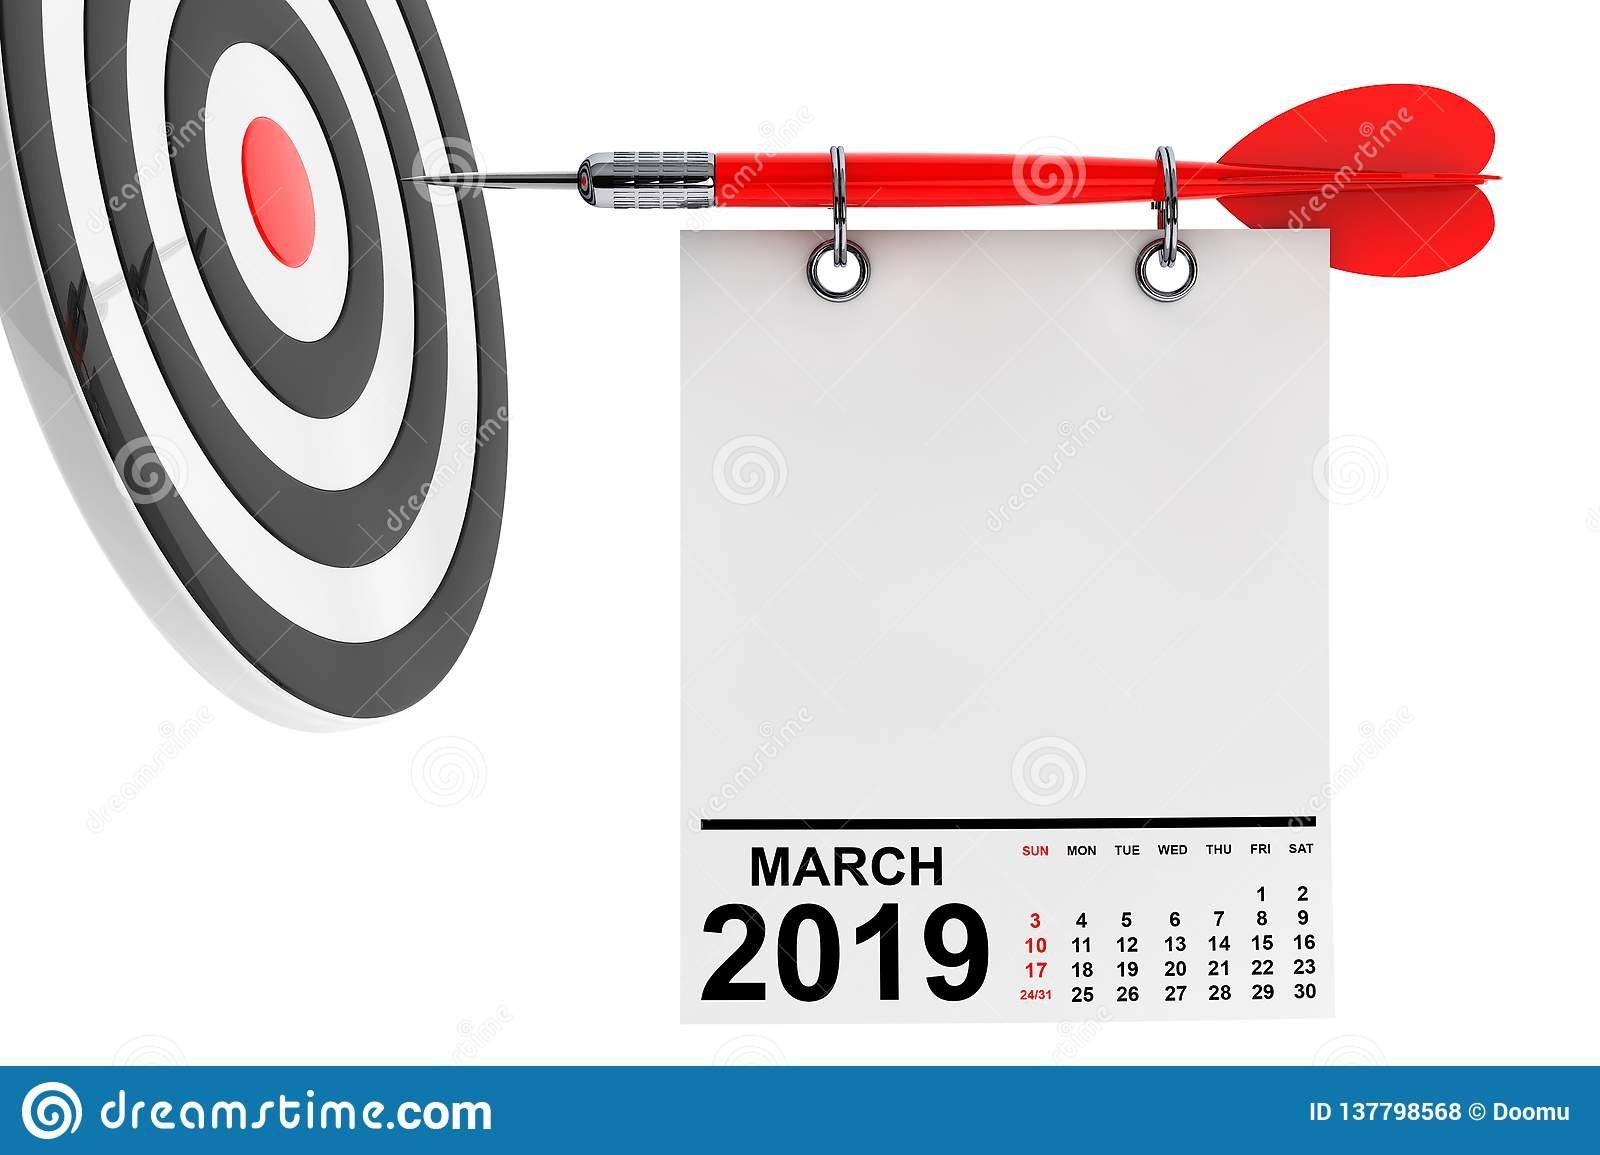 Calendar March 2019 With Target. 3D Rendering Stock Illustration Calendar 2019 Target